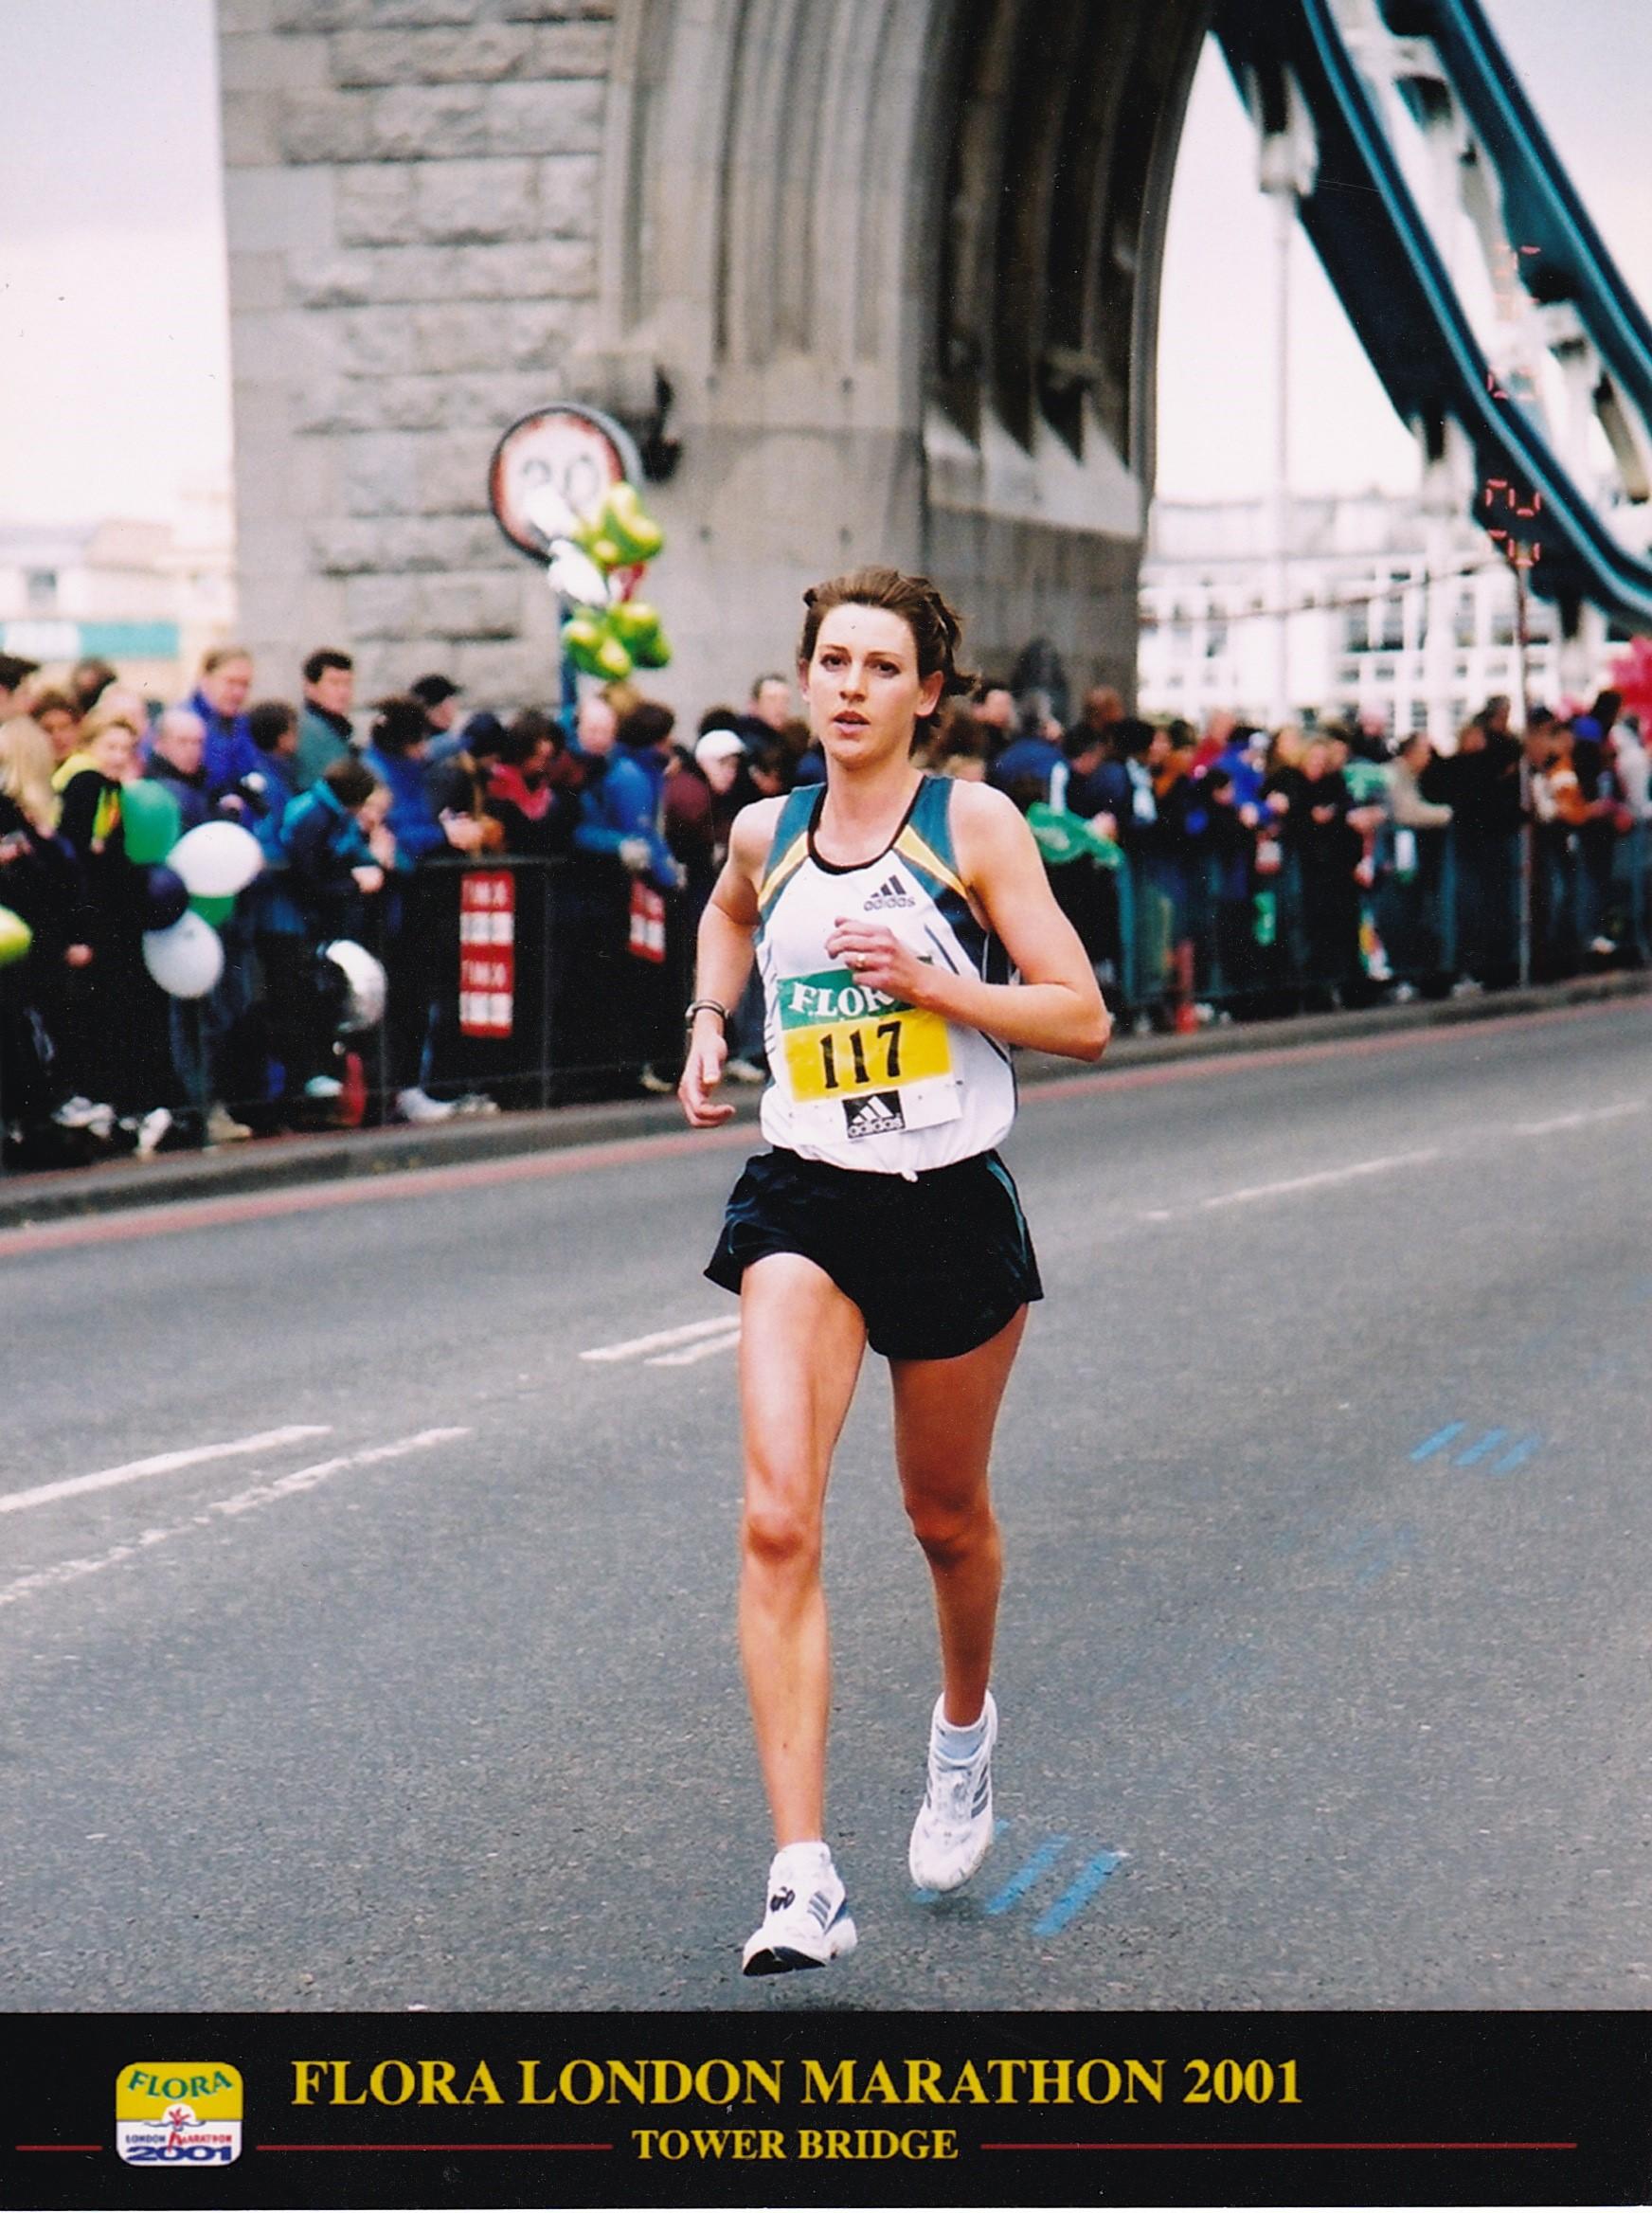 London marathon 2001 bridge